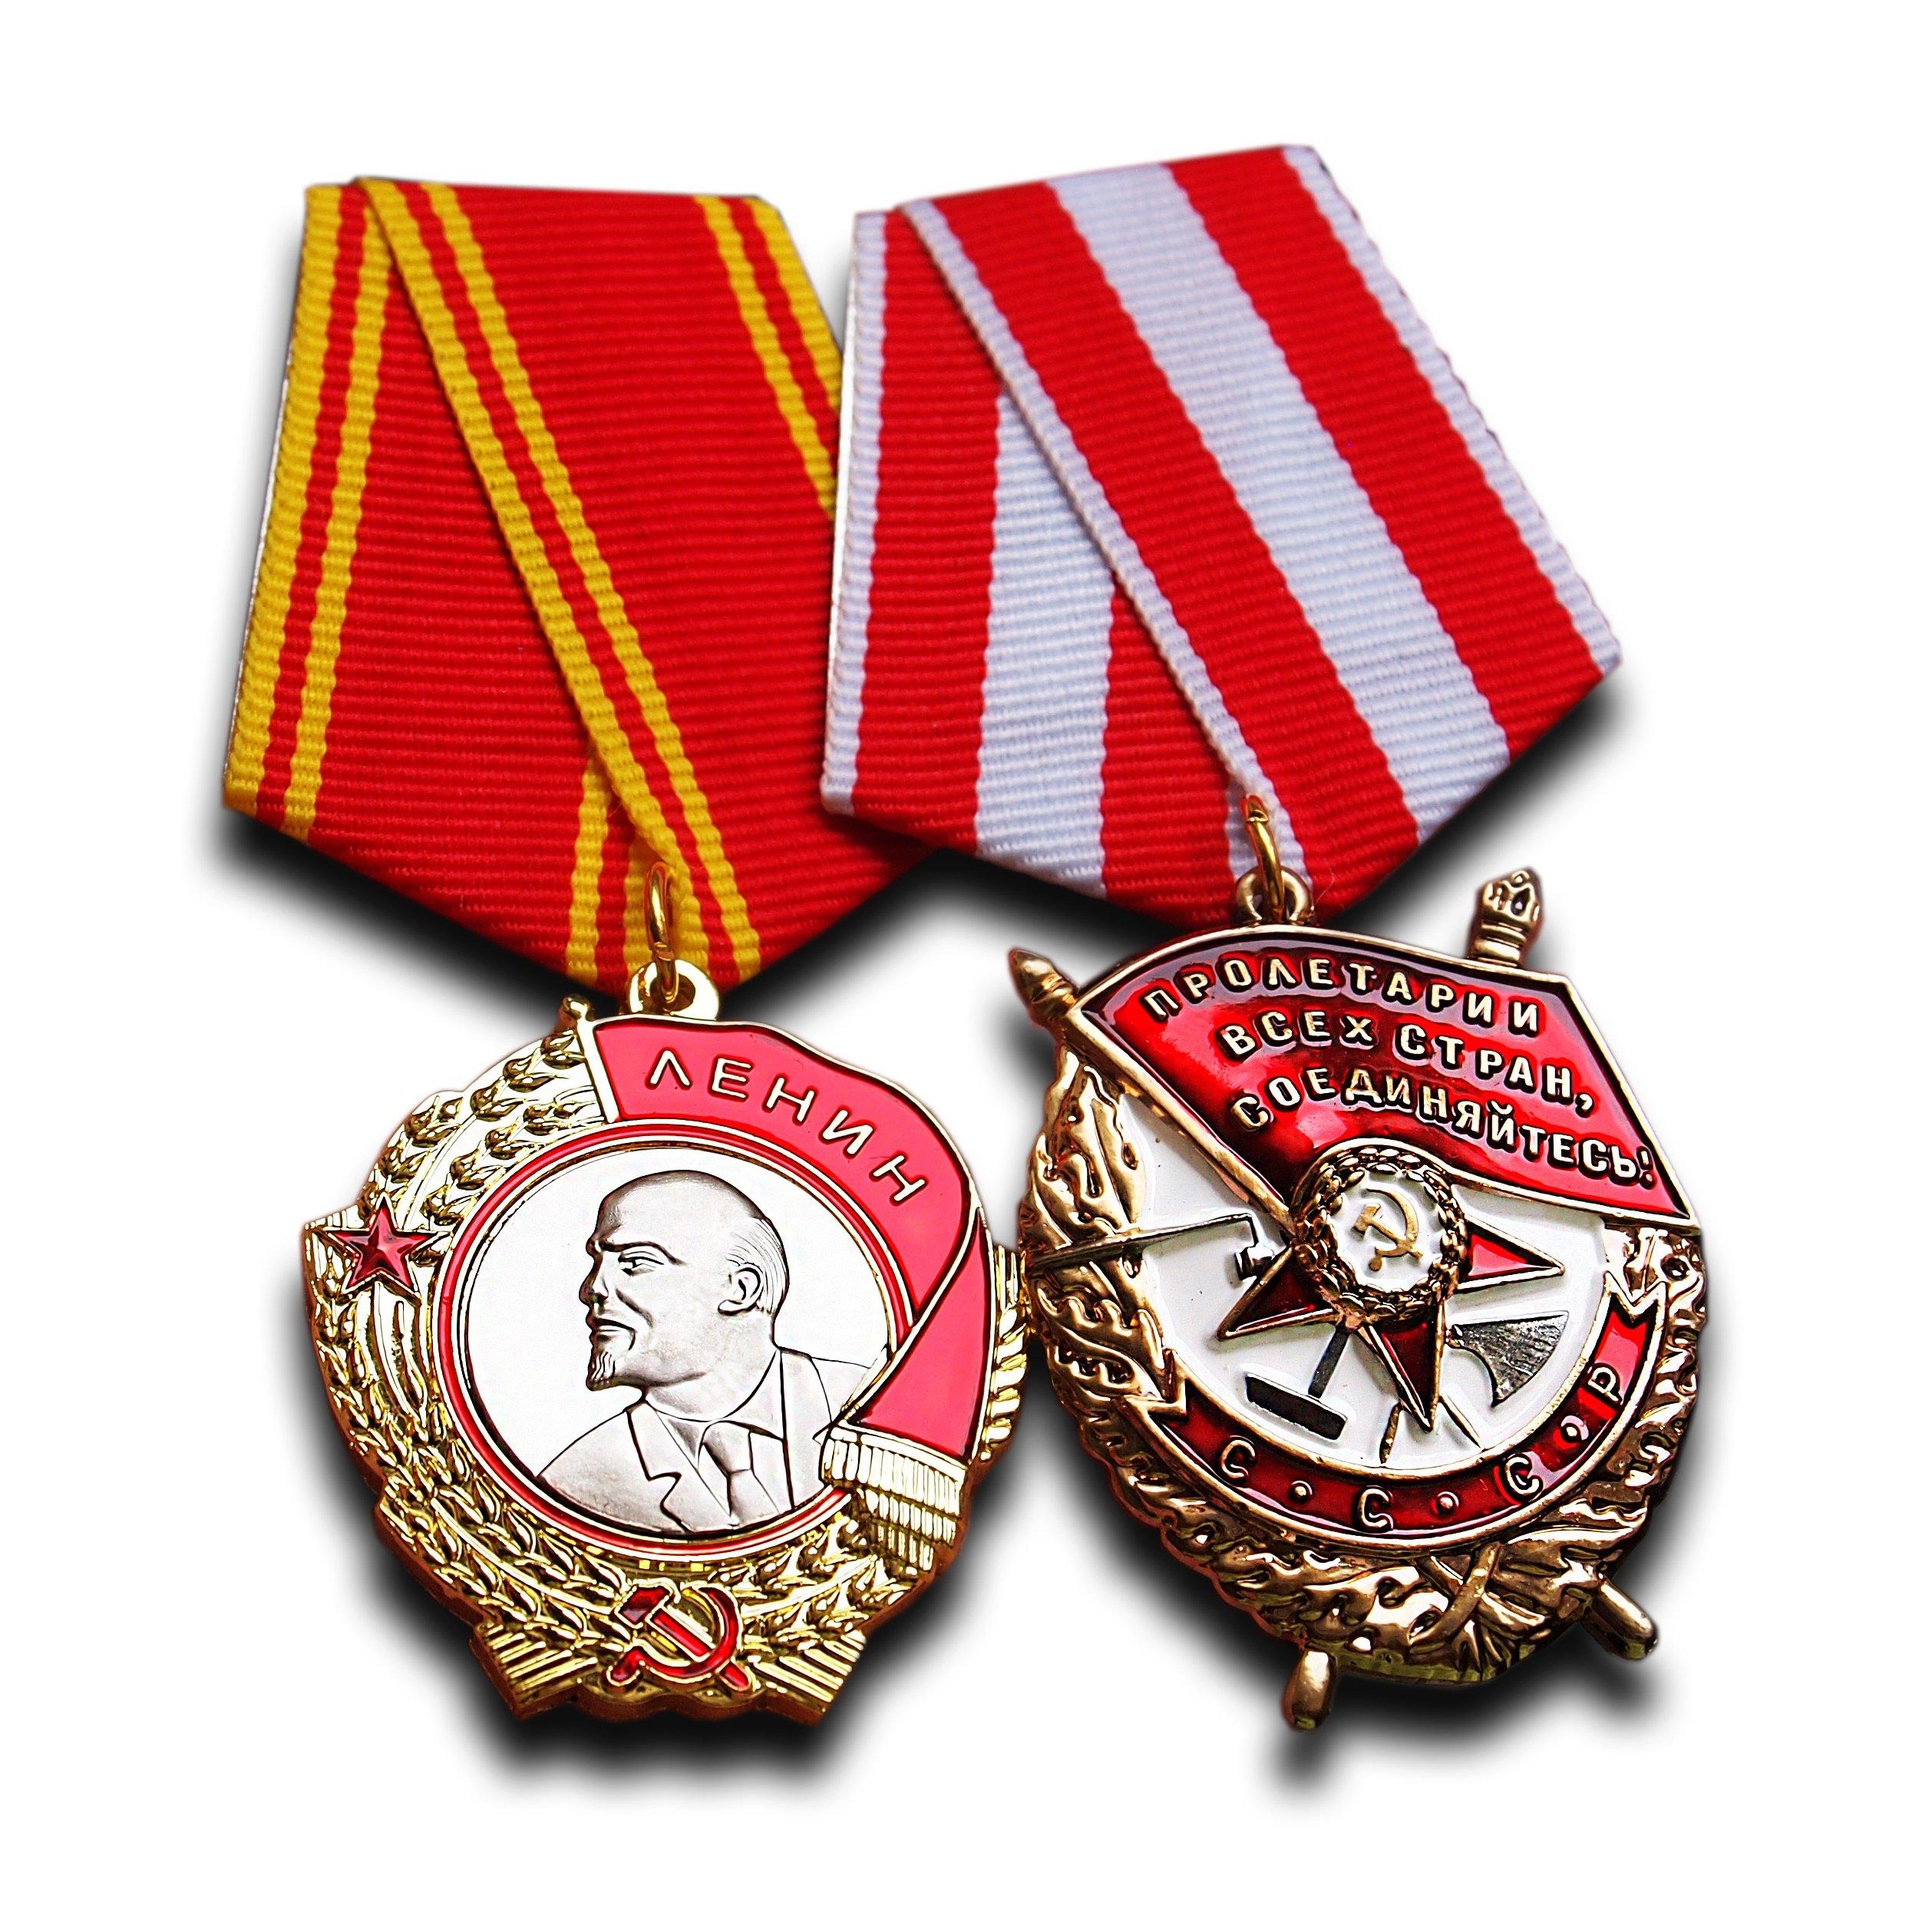 Order of Lenin + Order of The Red Banner Set - Highest Soviet Military Medal award for Exemplary Service Antique Reproduction USSR Soviet Gift